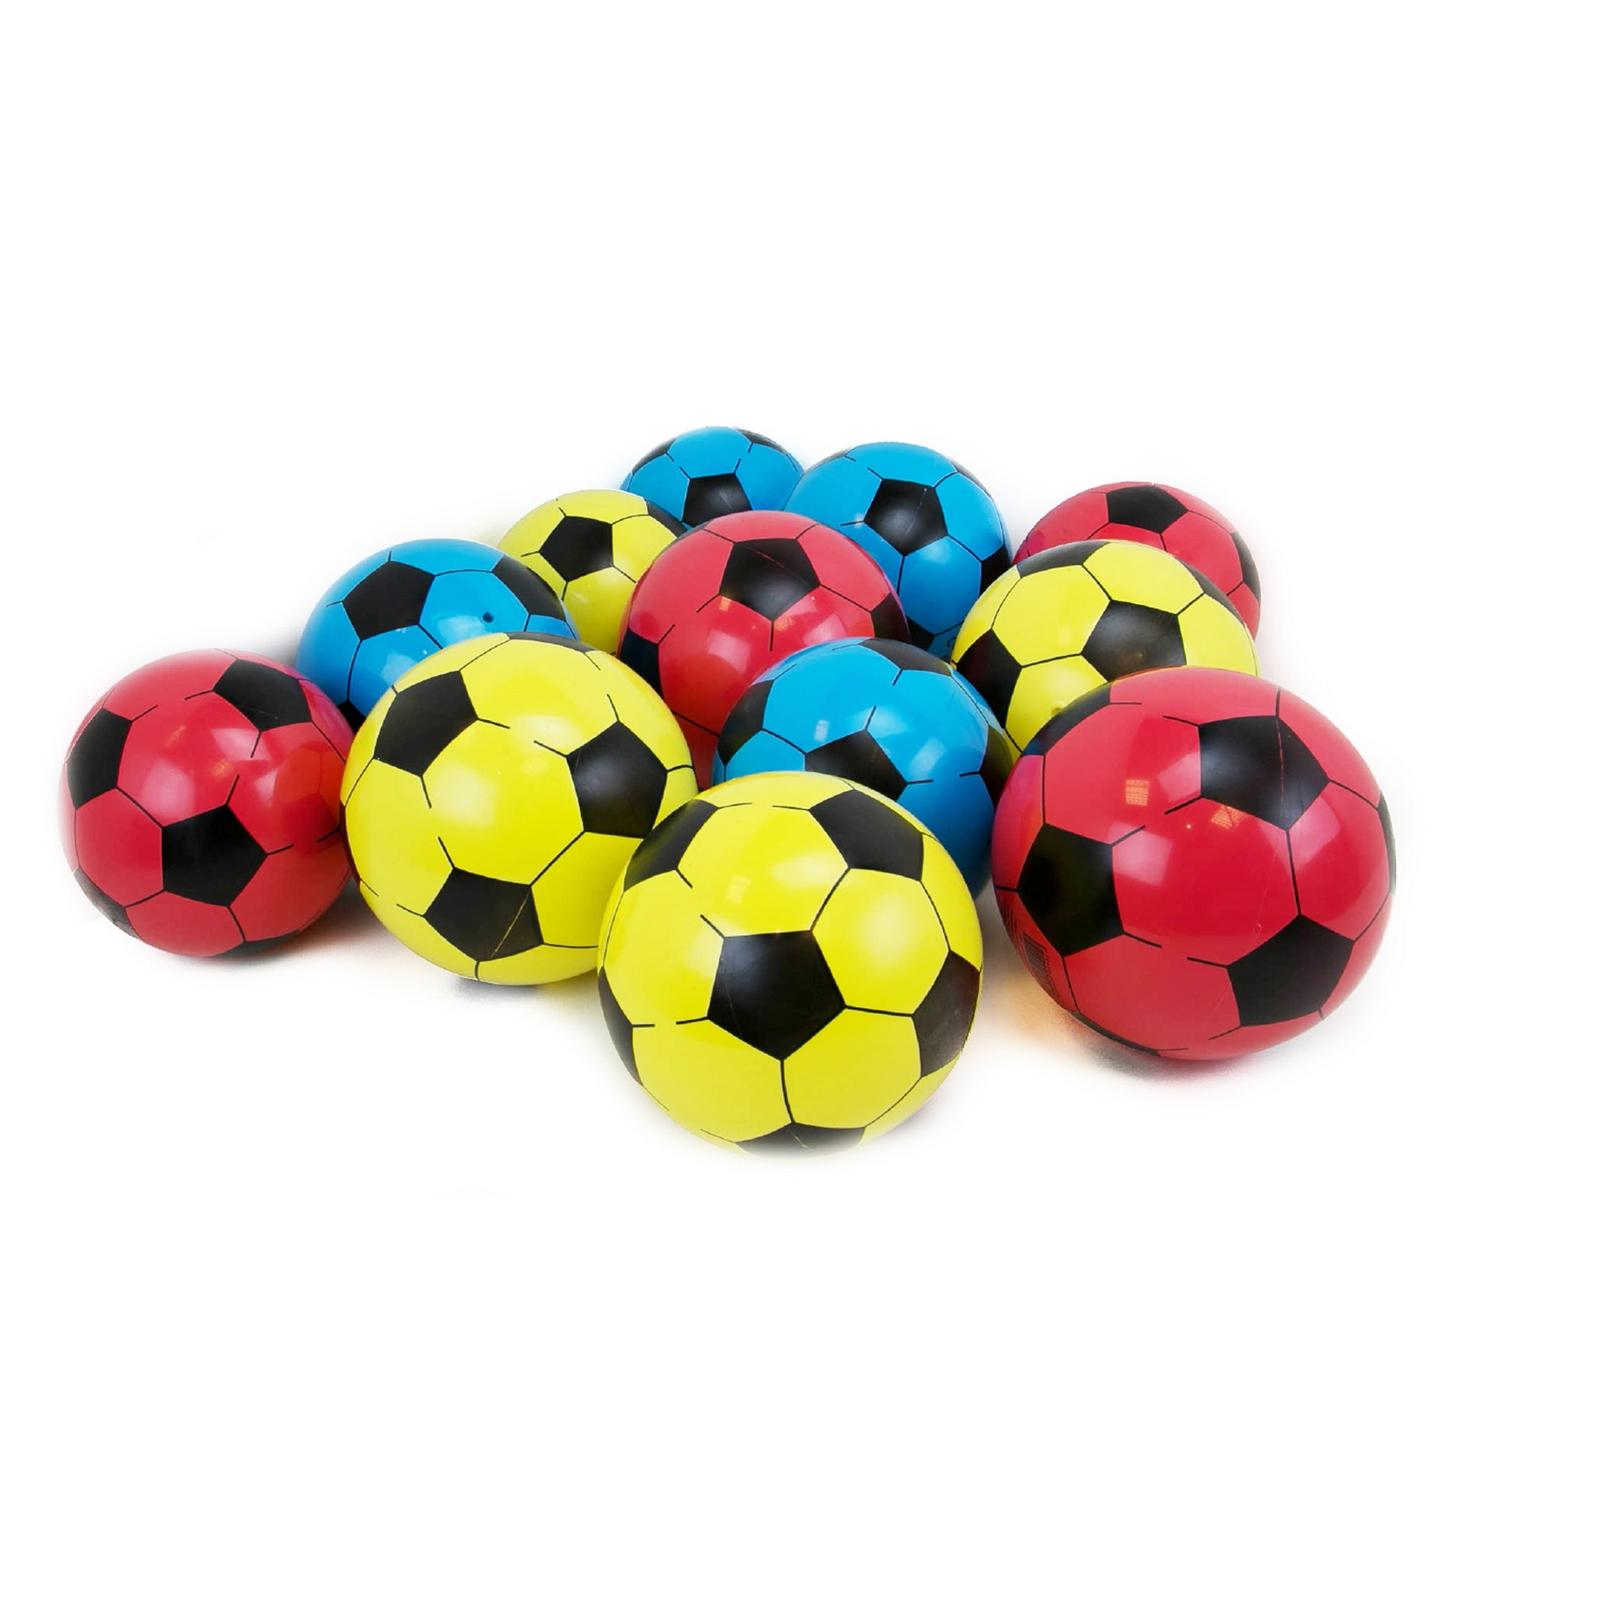 Soccer Play Balls - Pack of 12